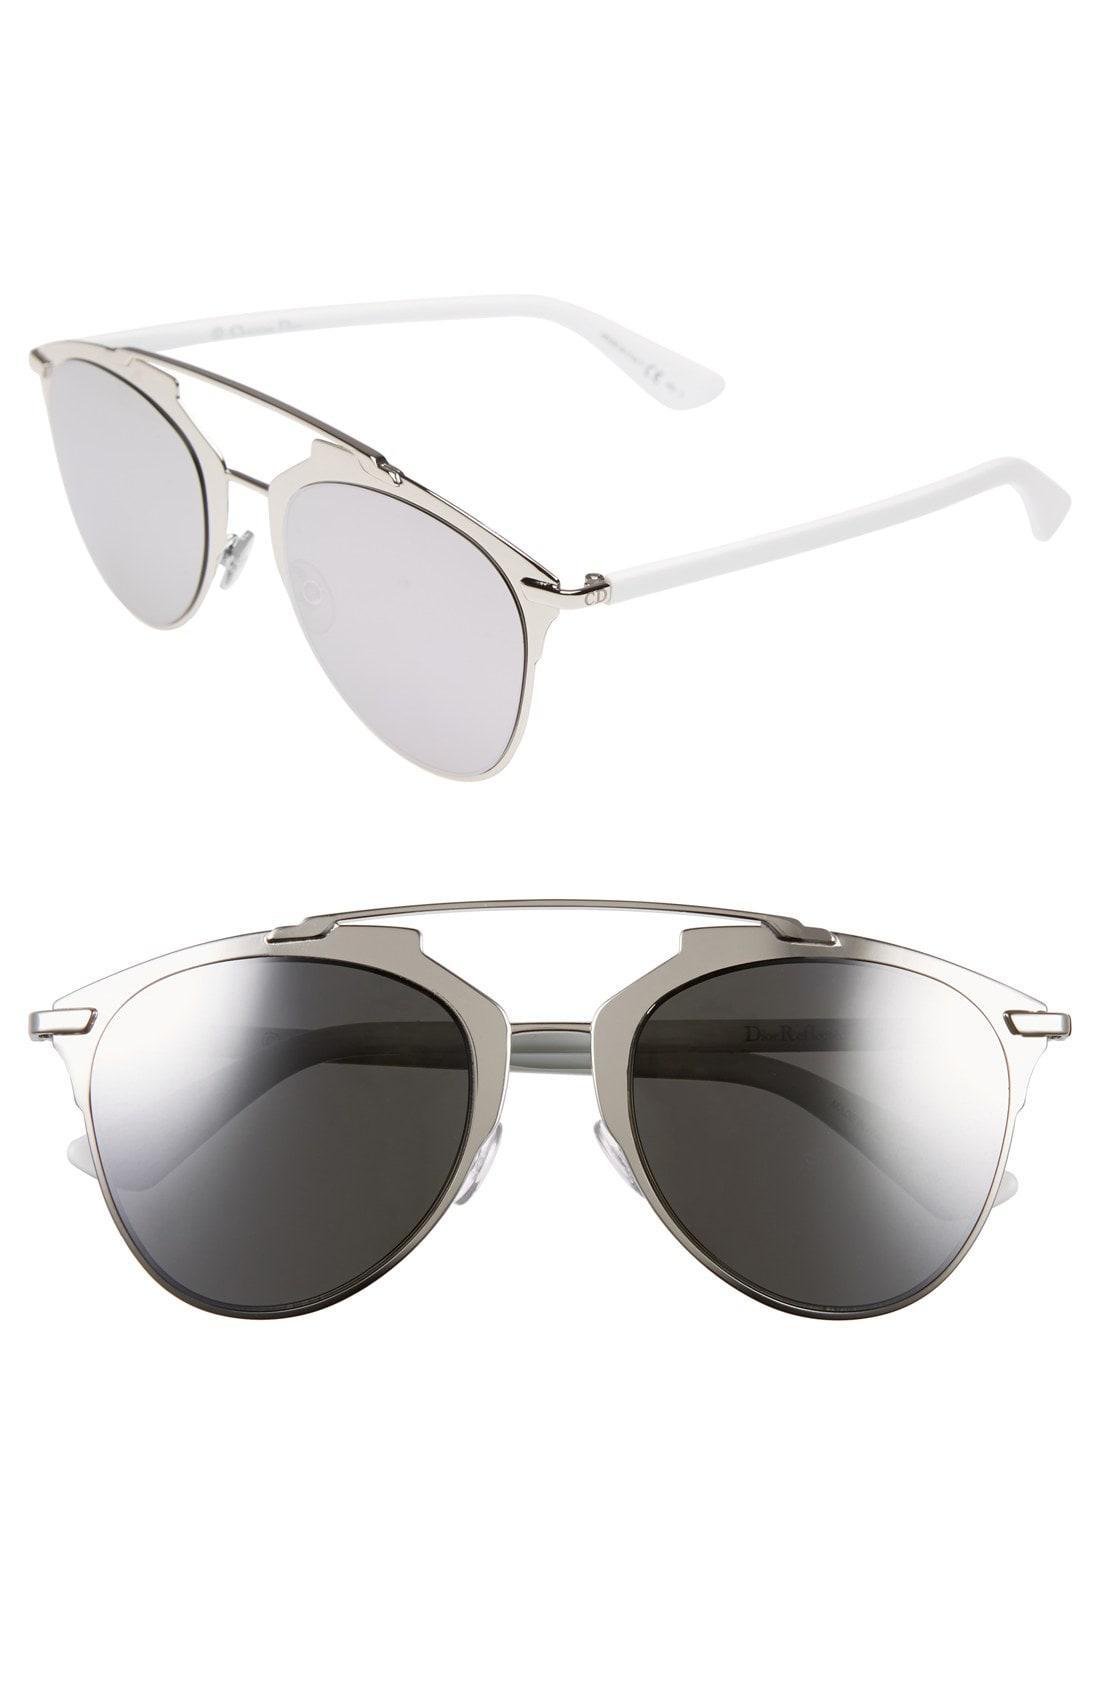 89b68ca89501 Lyst - Dior Reflected 52mm Brow Bar Sunglasses - Palladium  White in ...